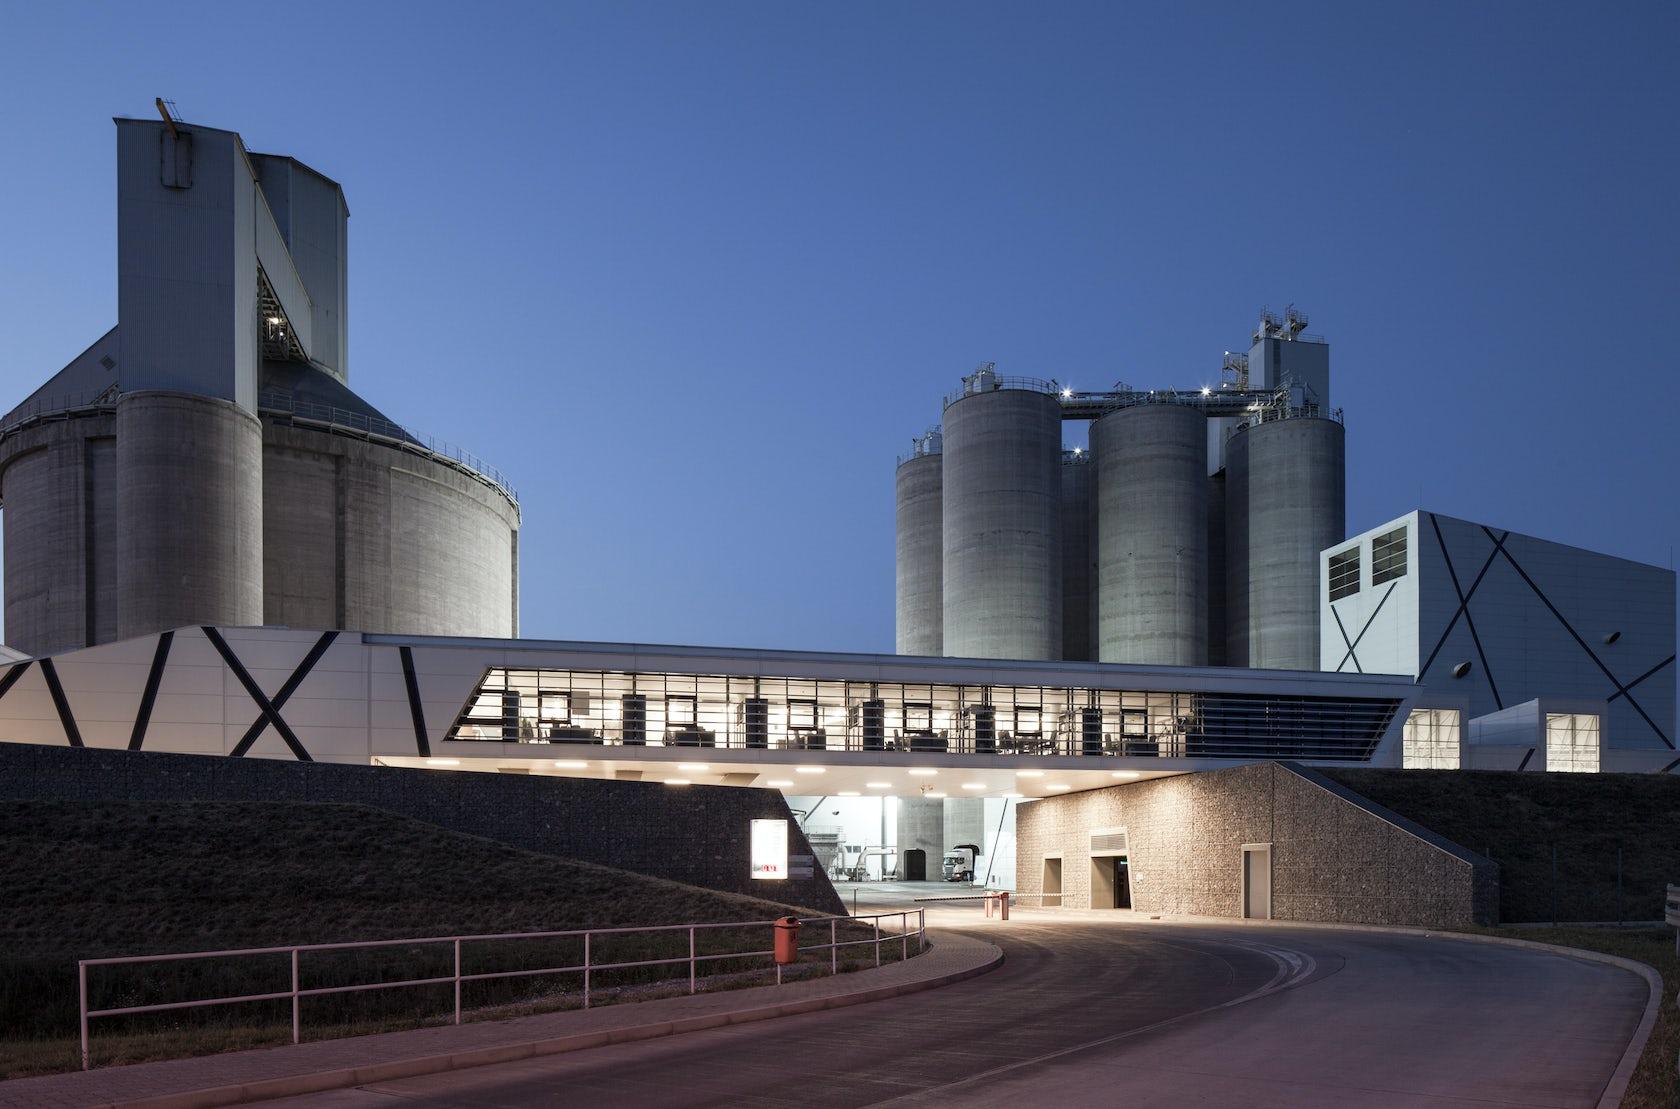 New York Cement Plants : Cement plant in szentlörinc architizer